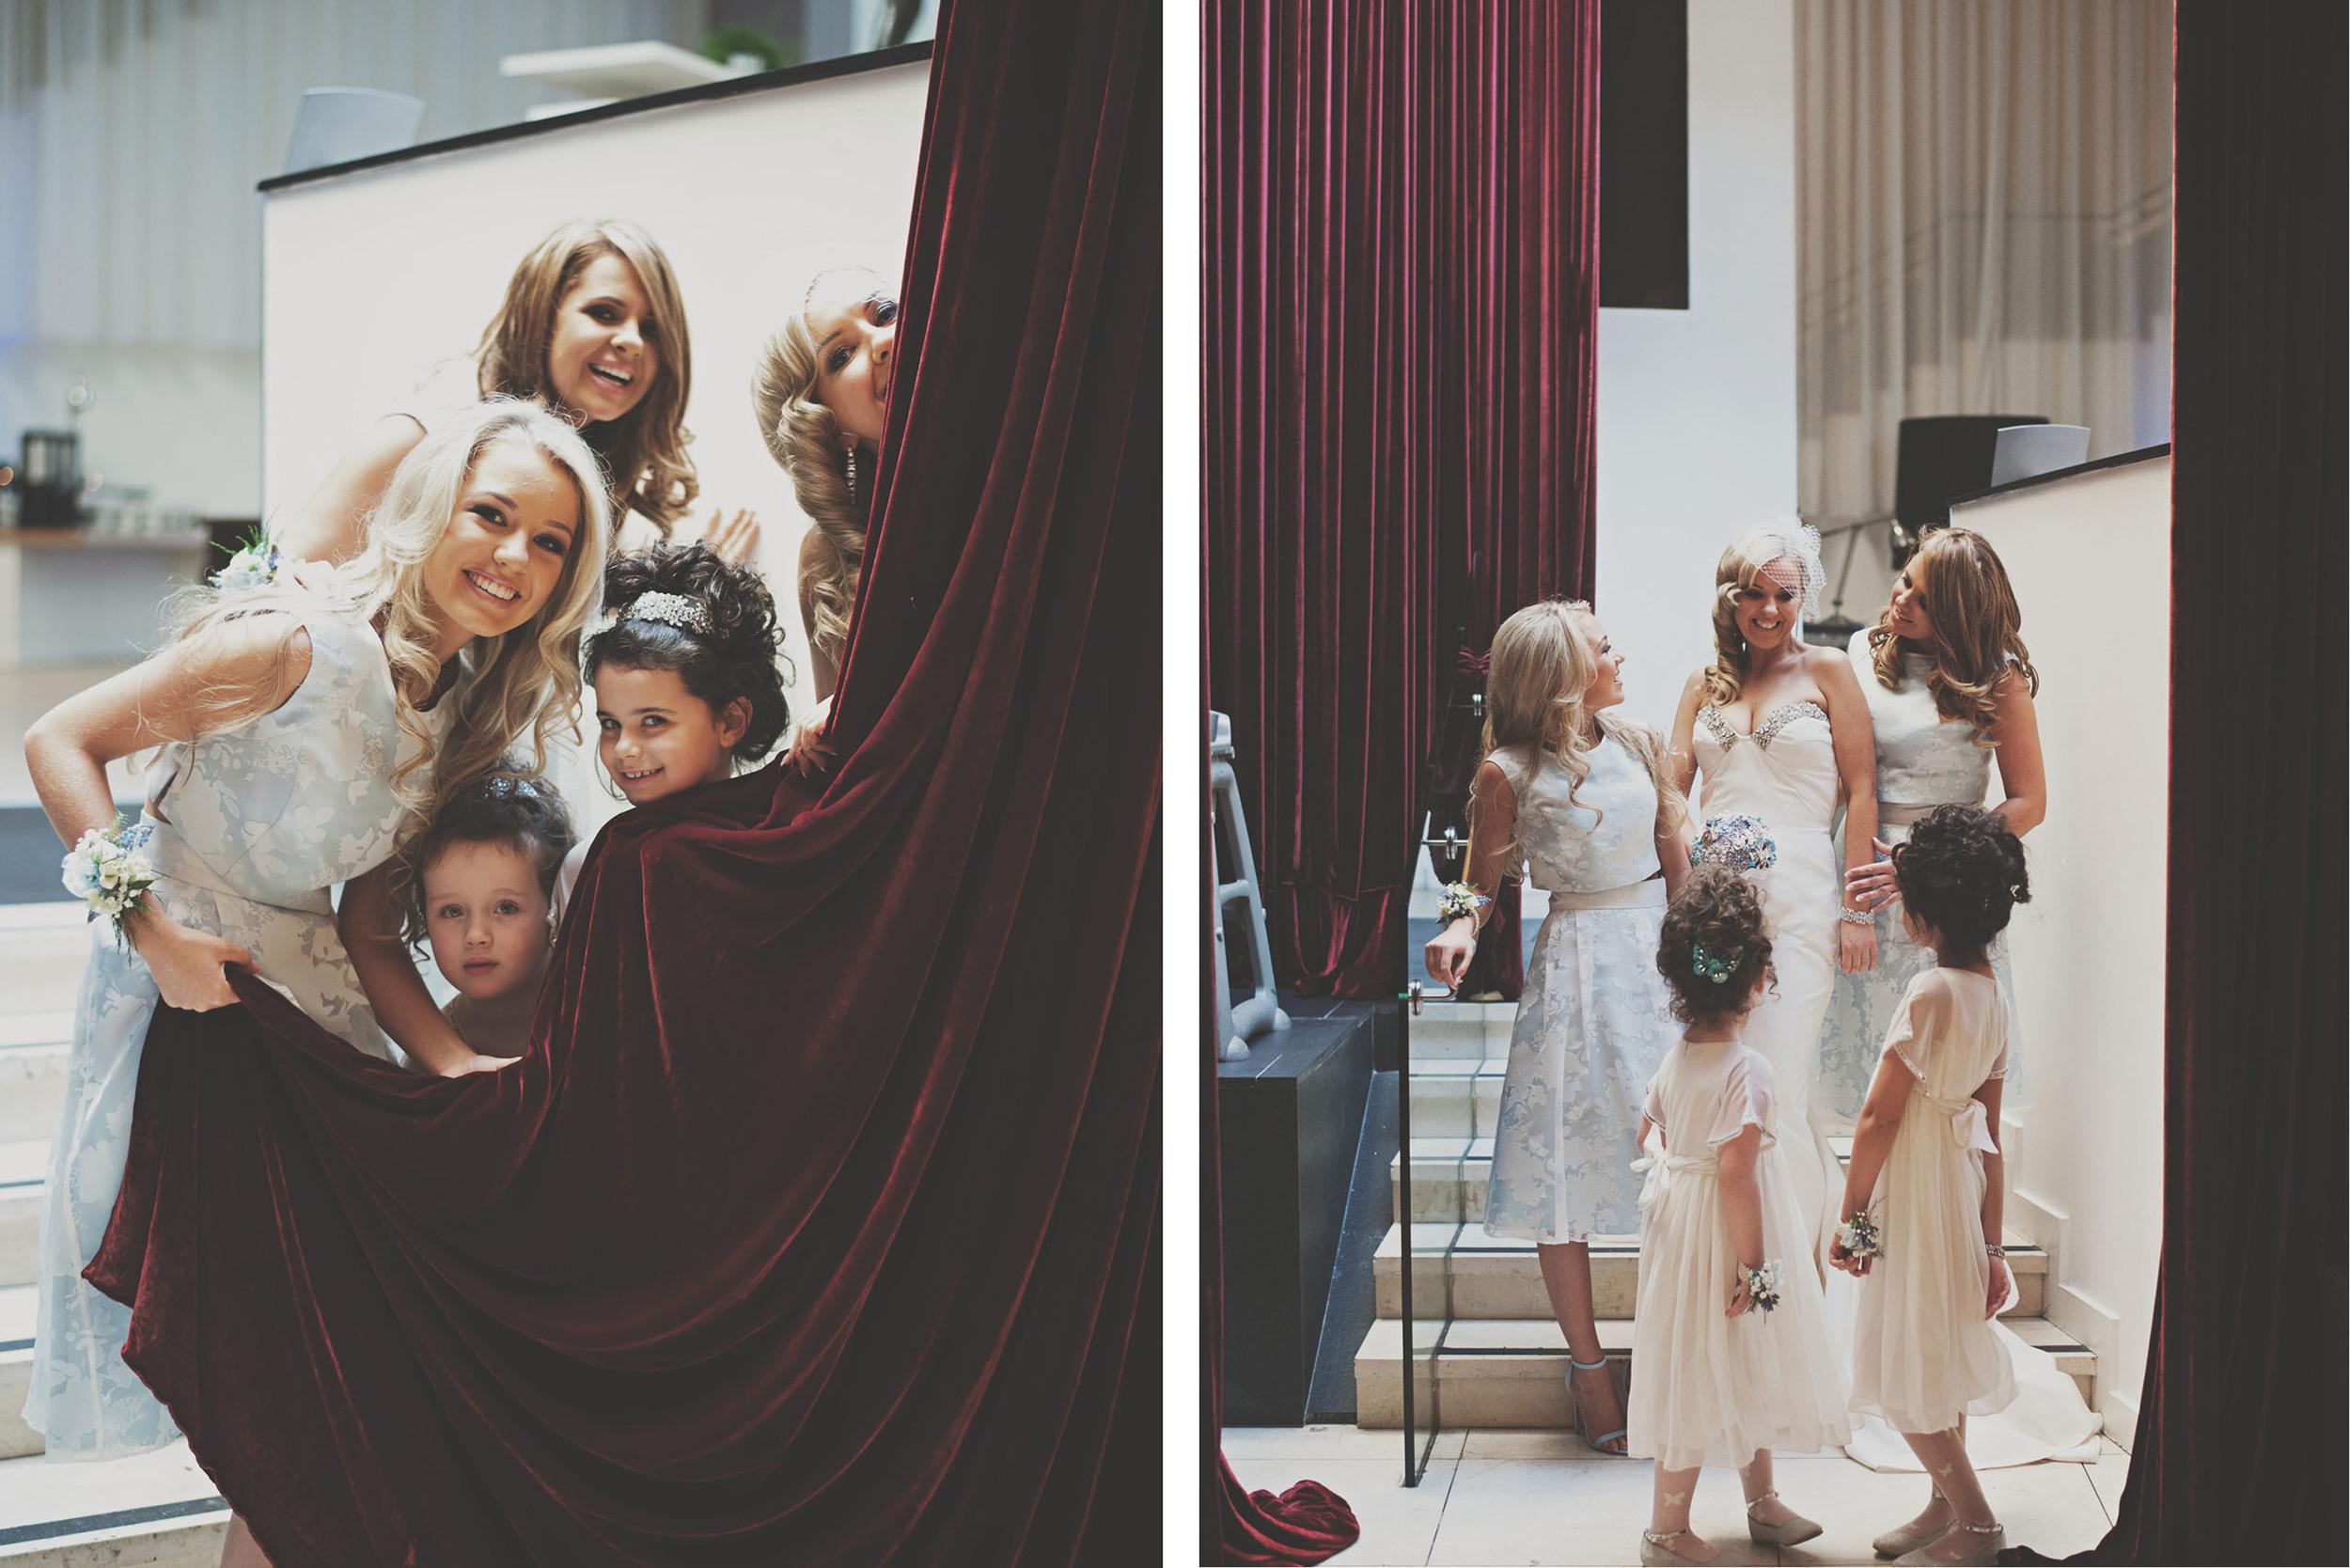 Bridal party frolics